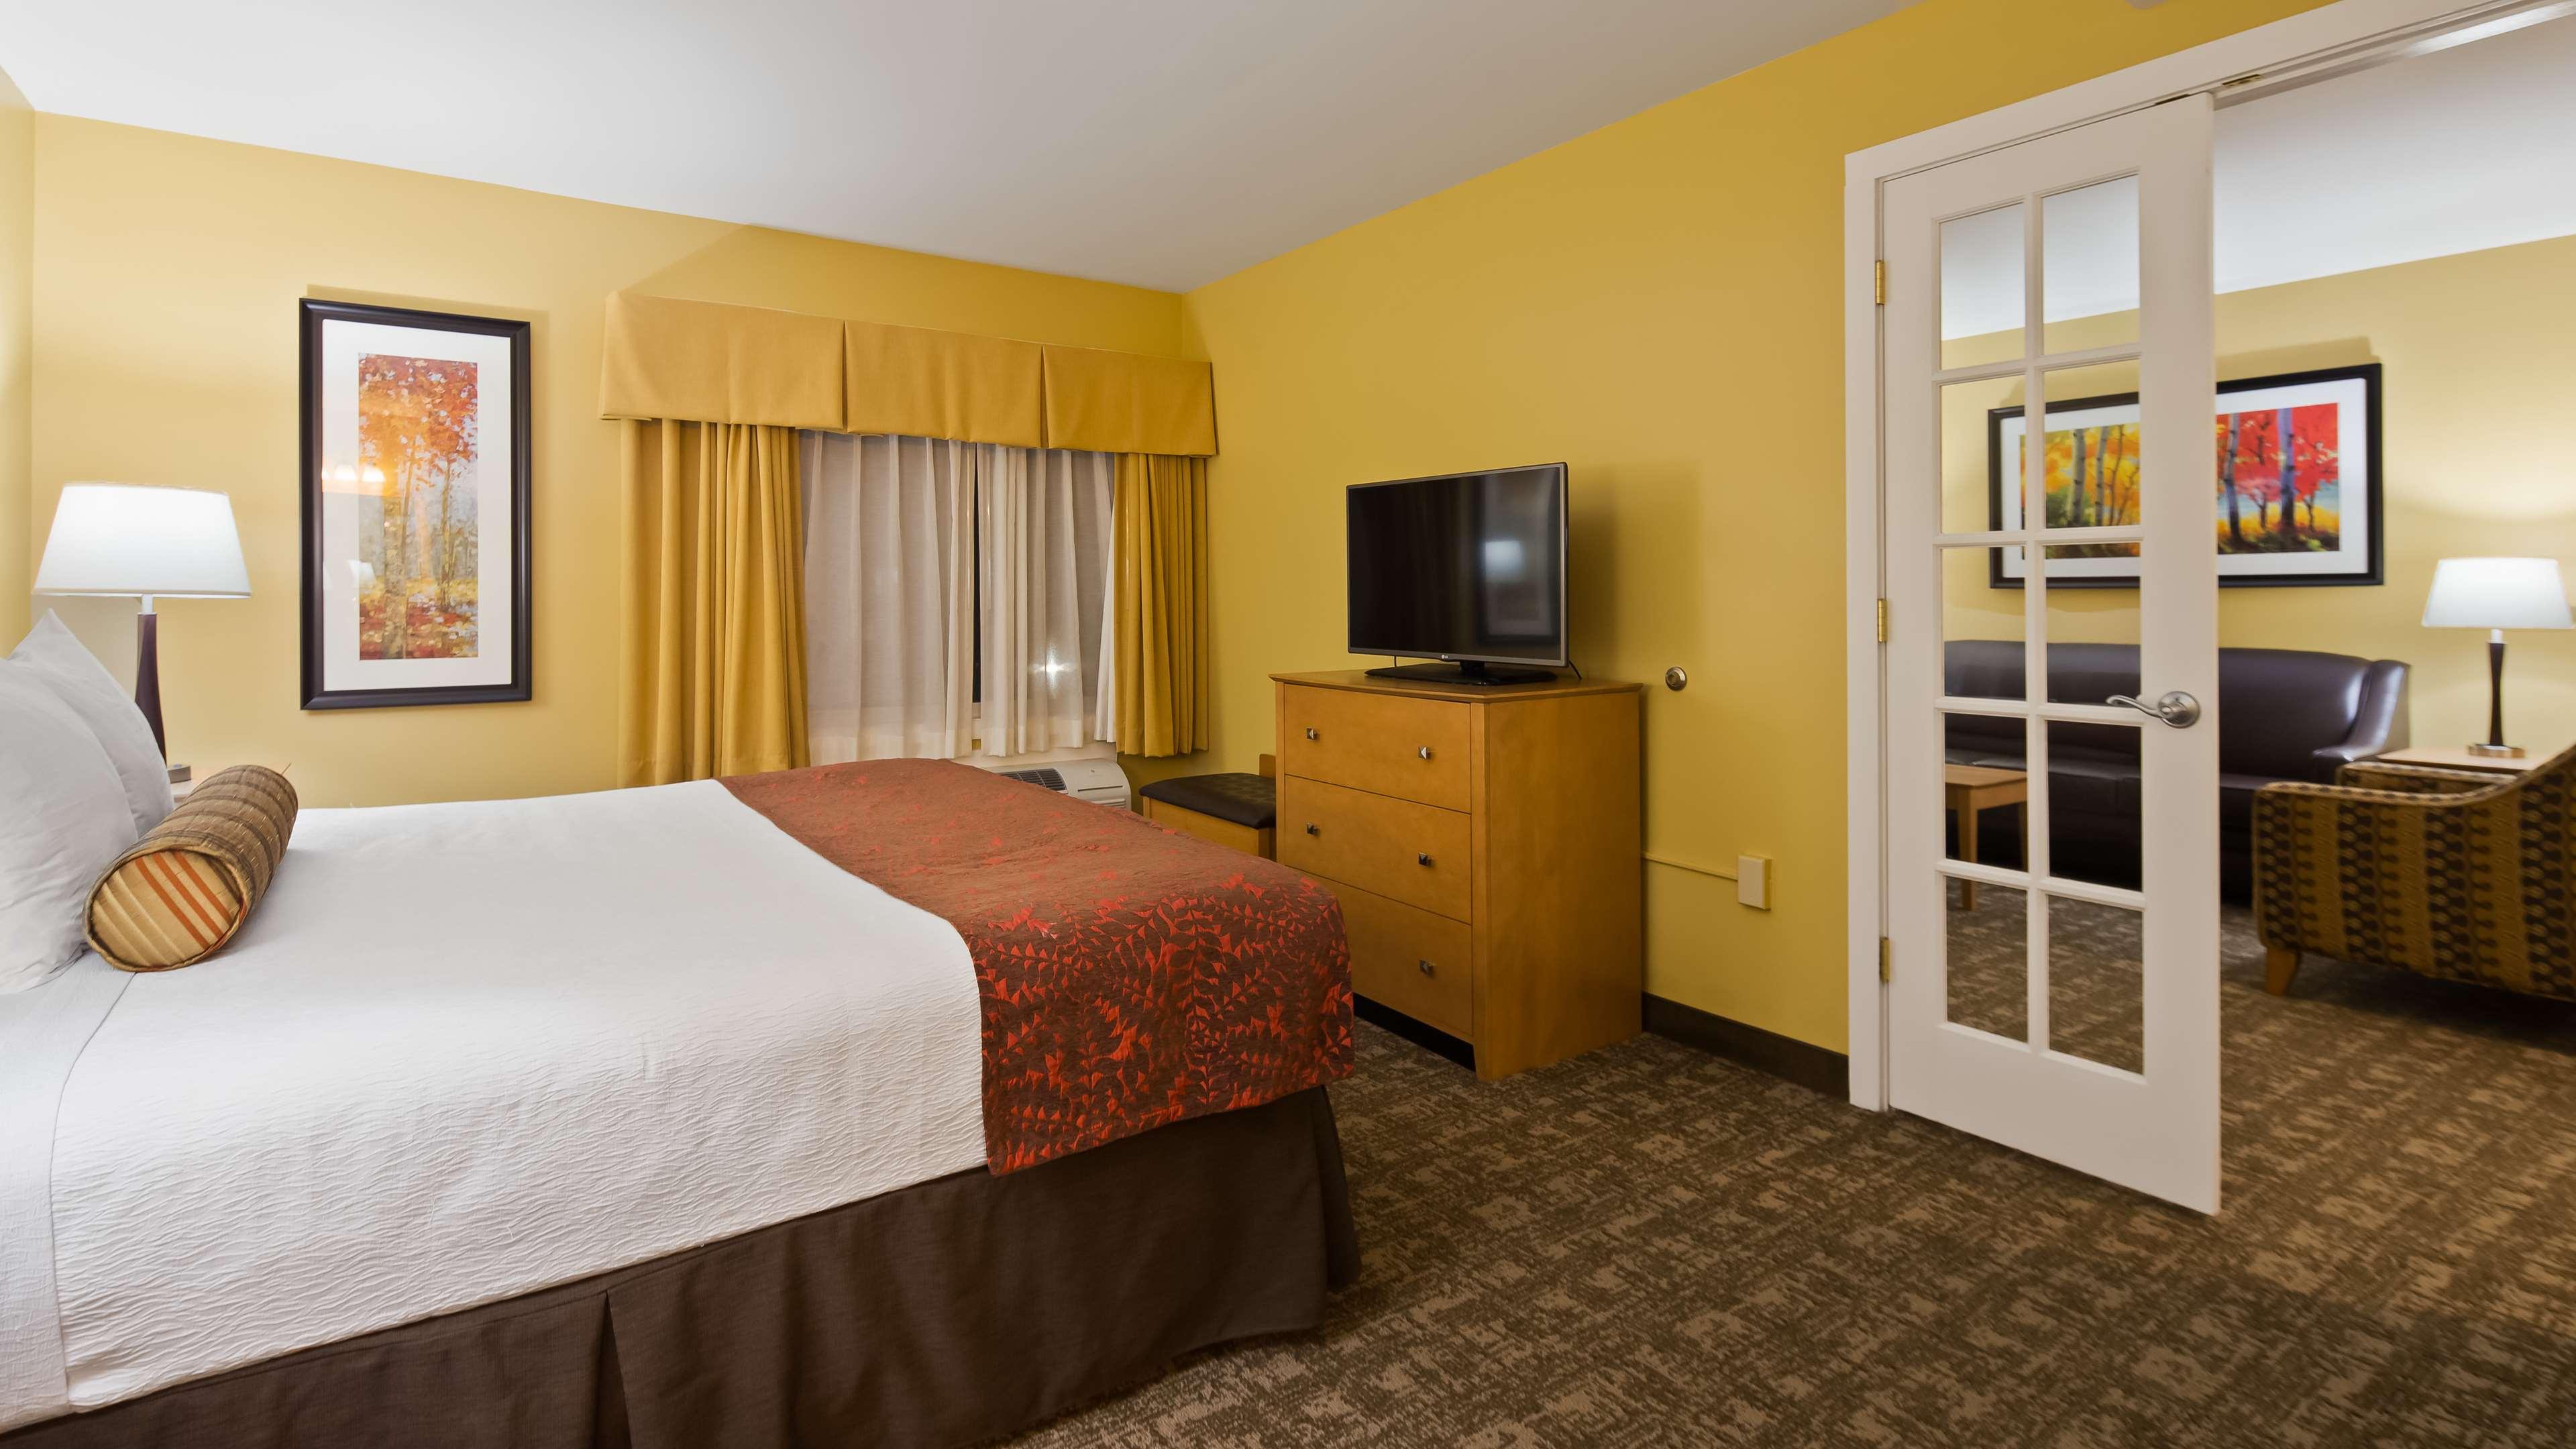 Best Western Plus Windjammer Inn & Conference Center image 20